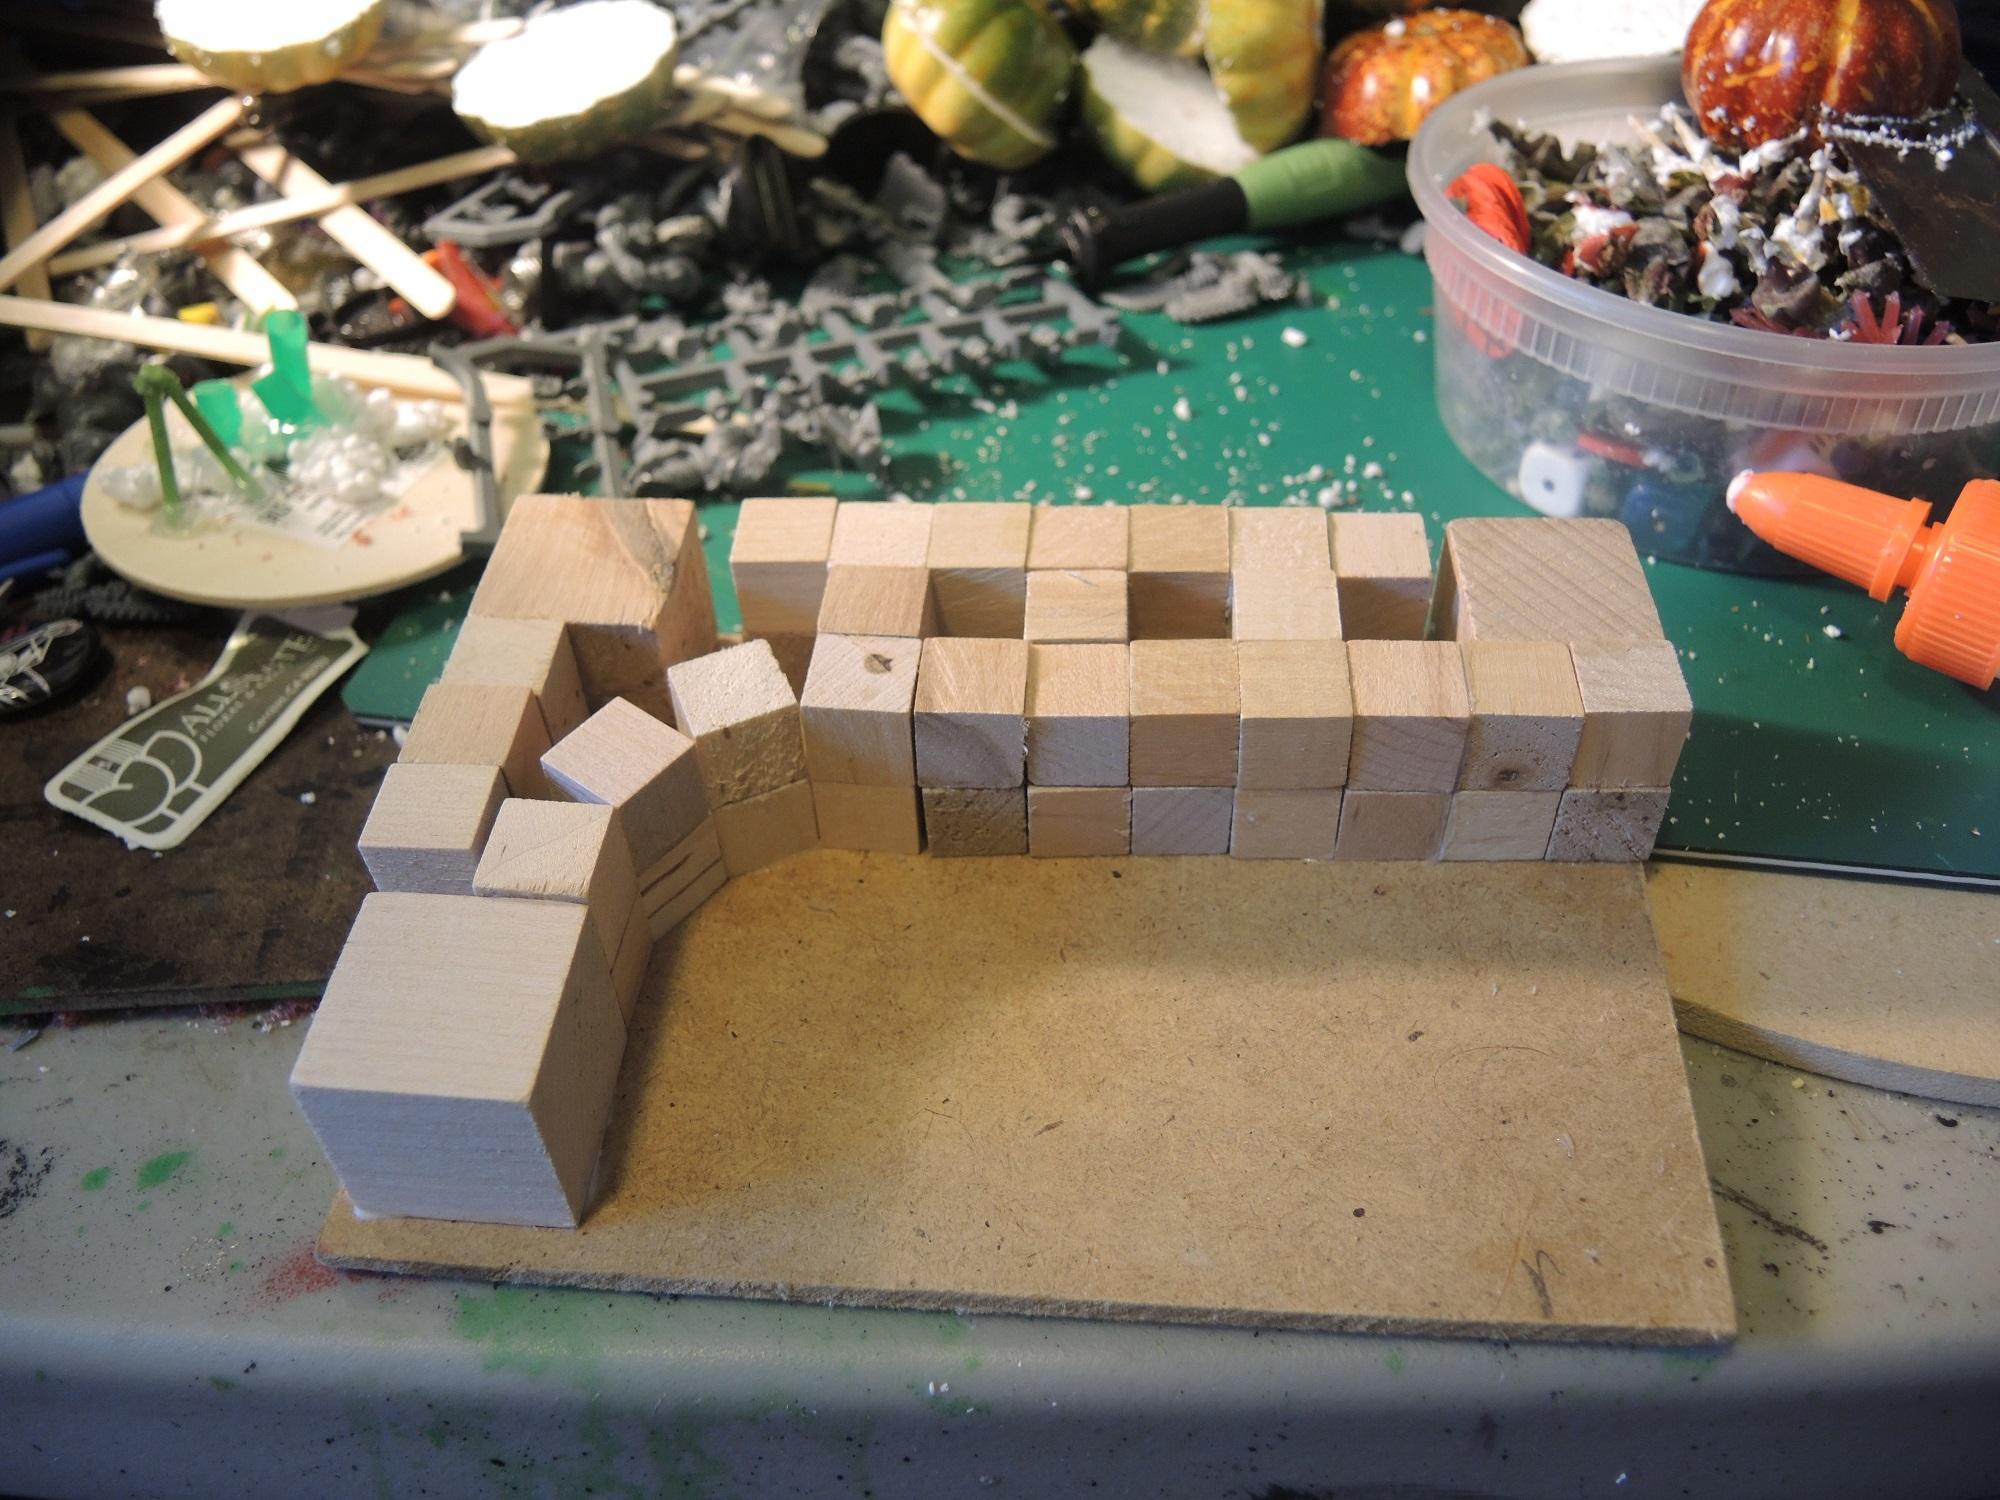 Alien, Commission, Garlic, Hot Glue, Hotglue, Jungle, Straws, Terrain, Tutorial, Waaazag, Waazag, Wood, Work In Progress